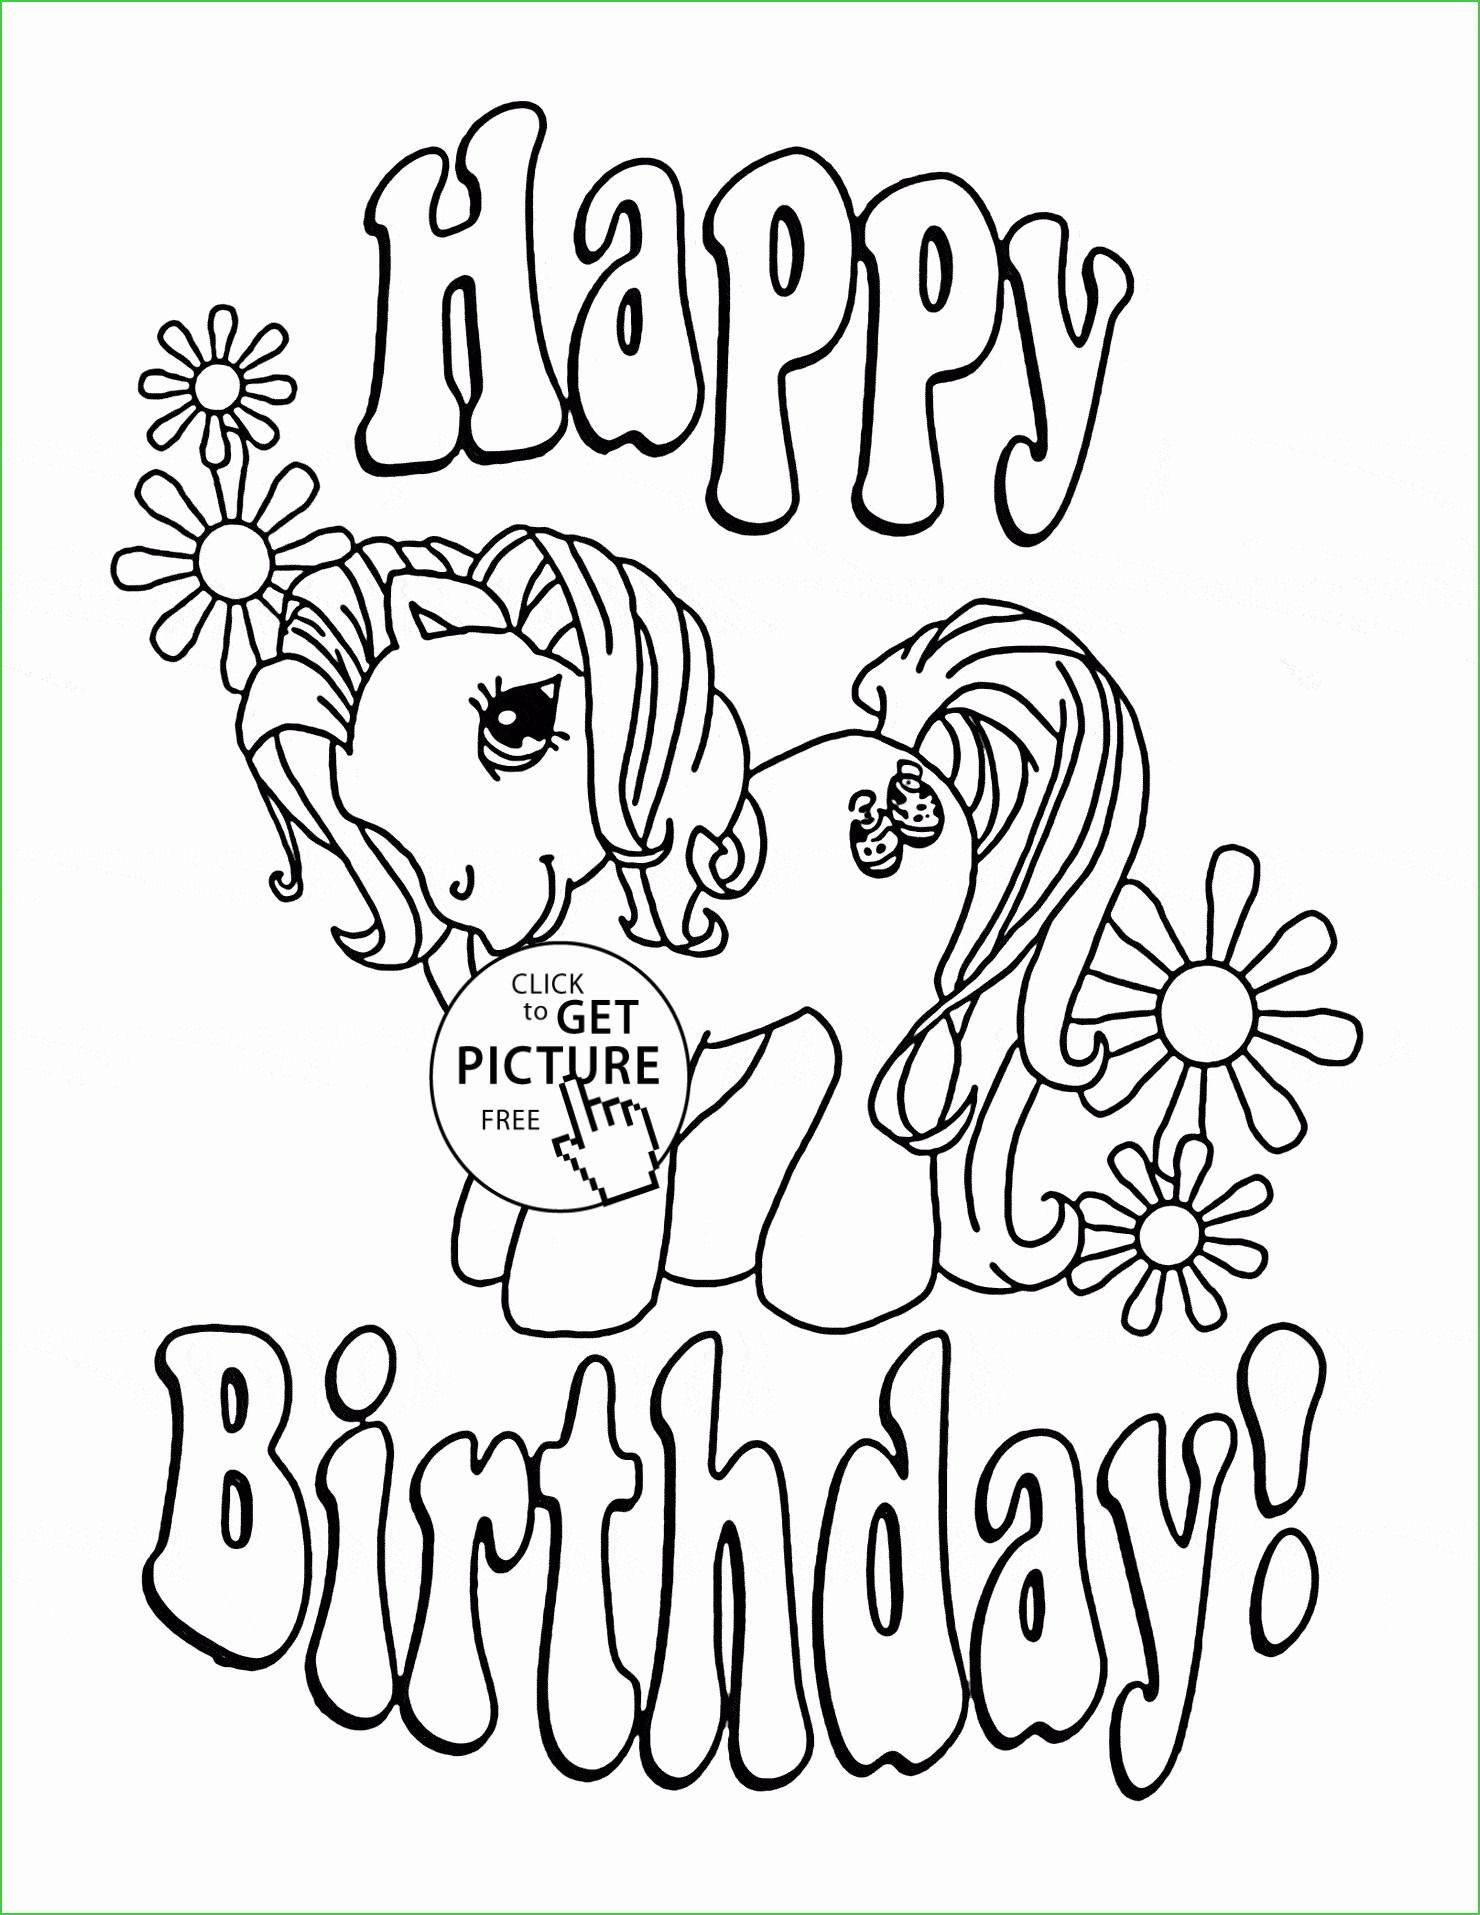 Free Printable Money Cards For Birthdays Luxury Of Luxury Happy - Free Printable Money Cards For Birthdays